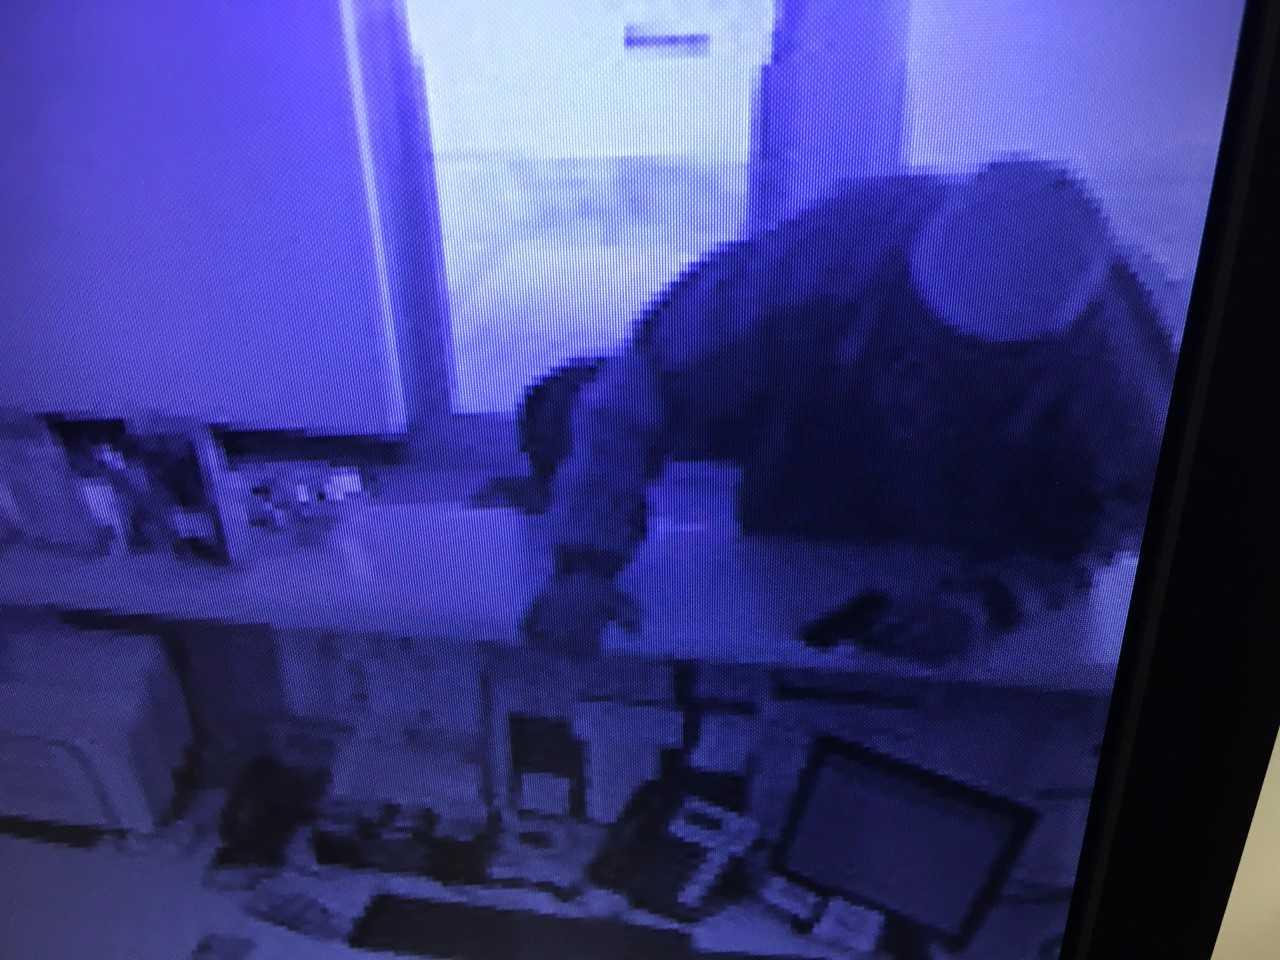 robbery2_1508279650508.jpg